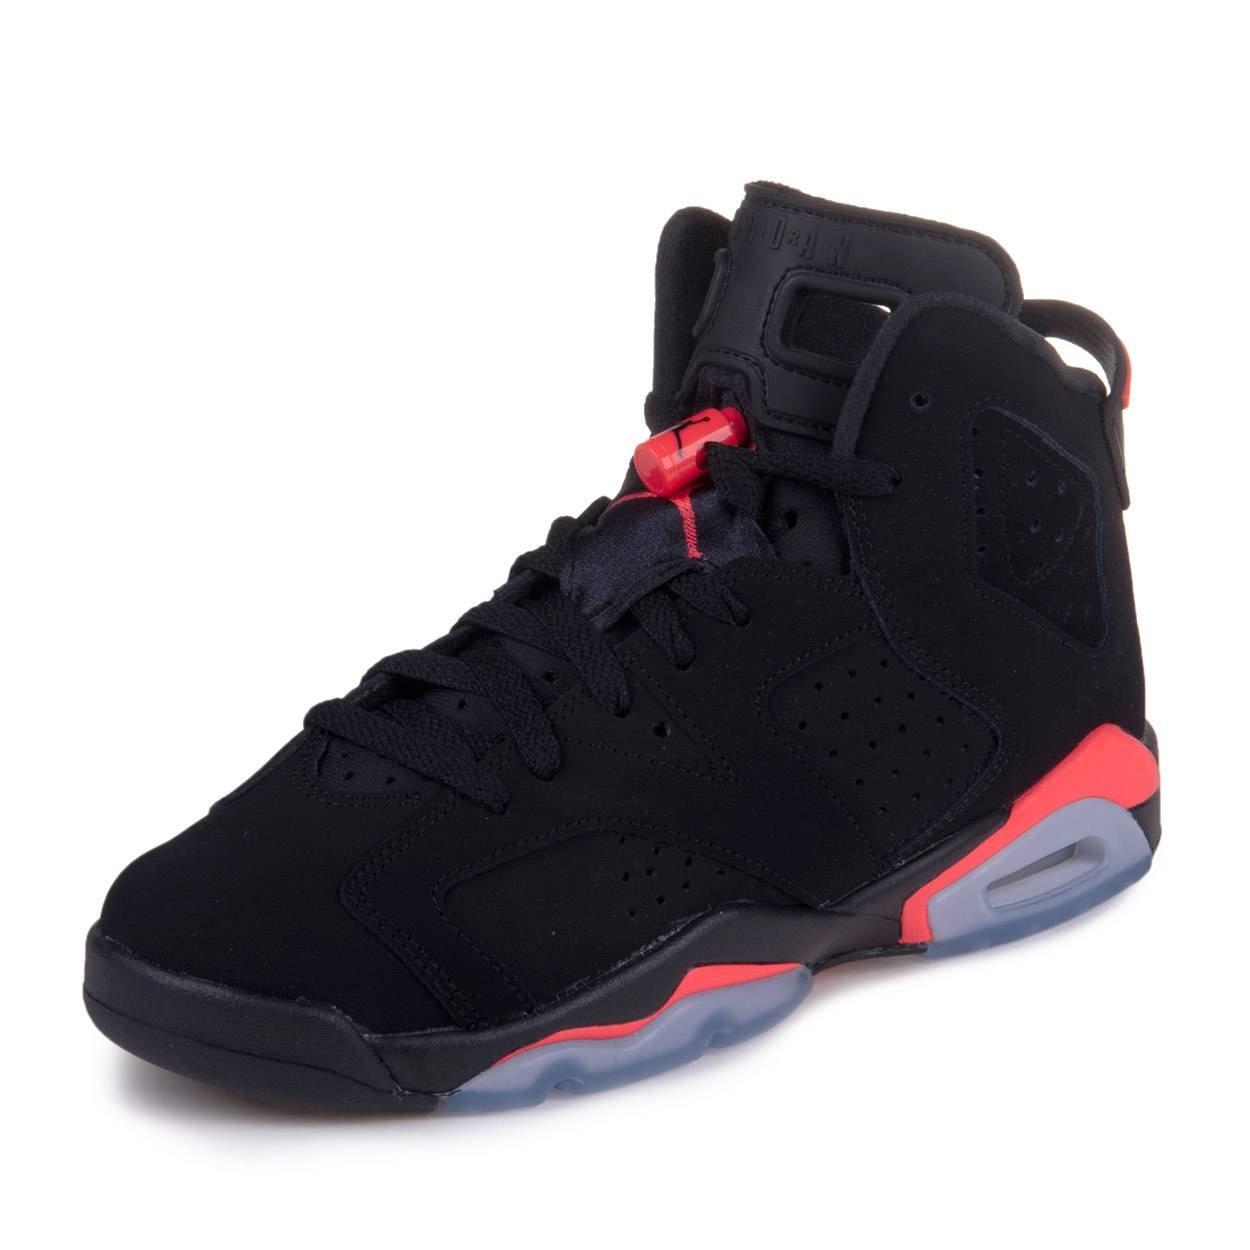 uk availability c0920 d2583 Galleon - Jordan Kids (GS) Retro 6 Black Infrared 23 384665-023 7